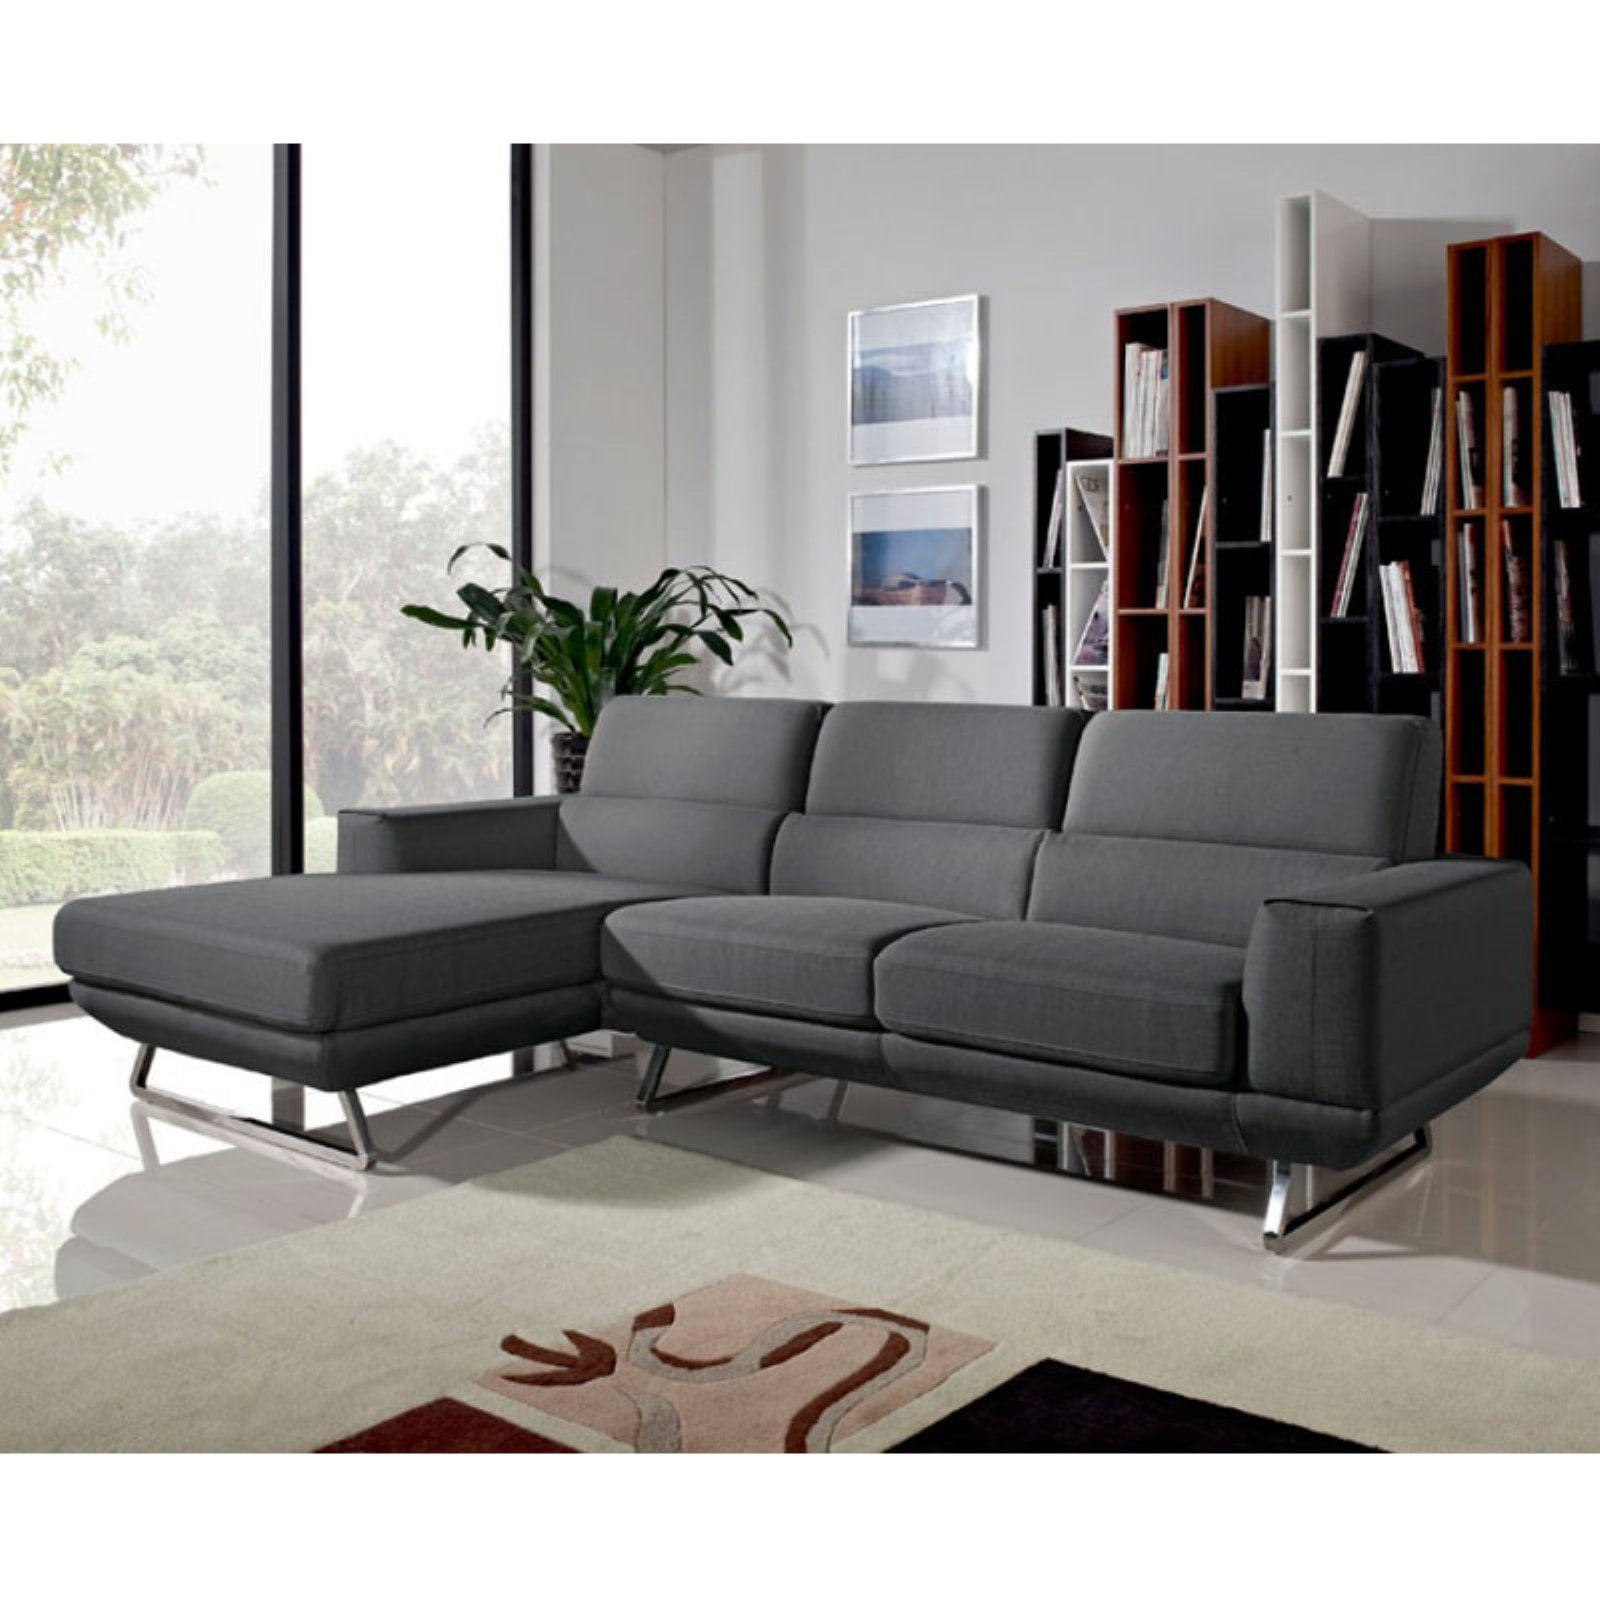 Divani Casa Becket Modern Fabric Sectional Sofa